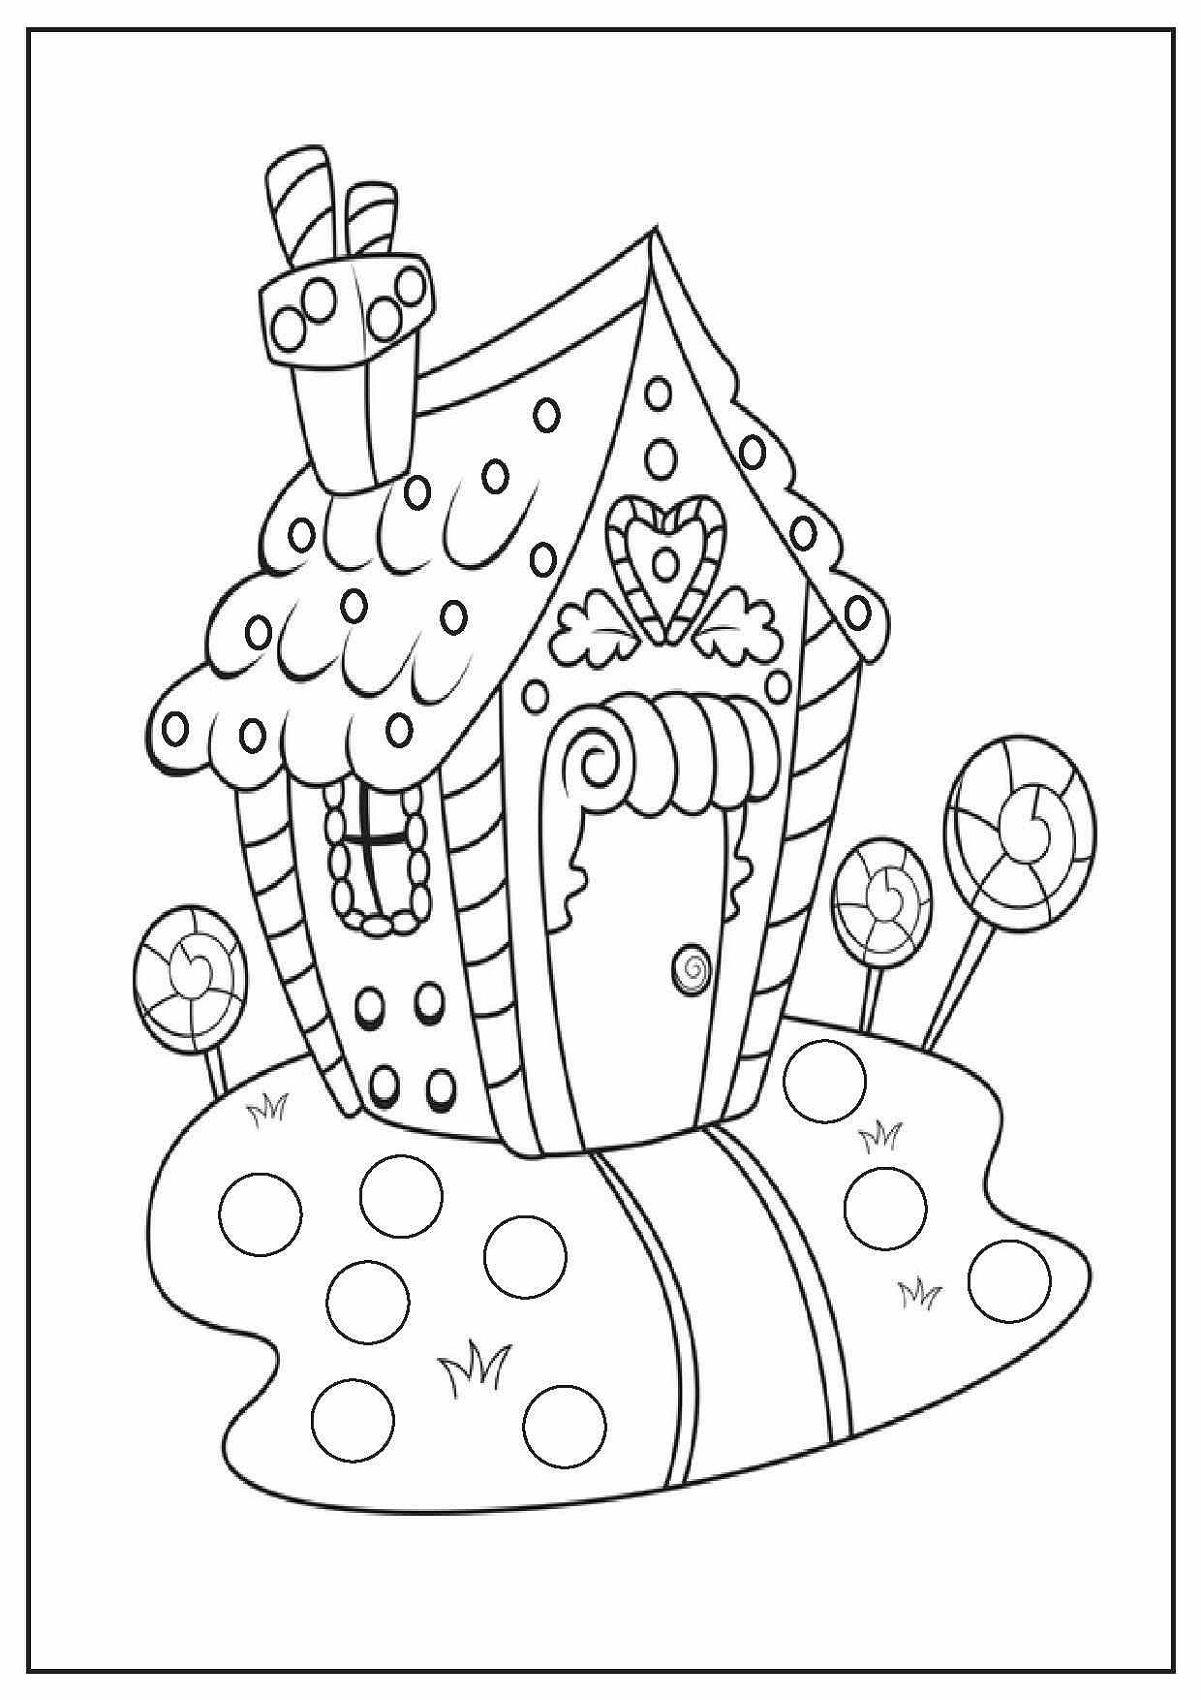 Printable Activity Sheets For Kids Printable Christmas Coloring Pages Christmas Coloring Sheets Free Christmas Coloring Pages